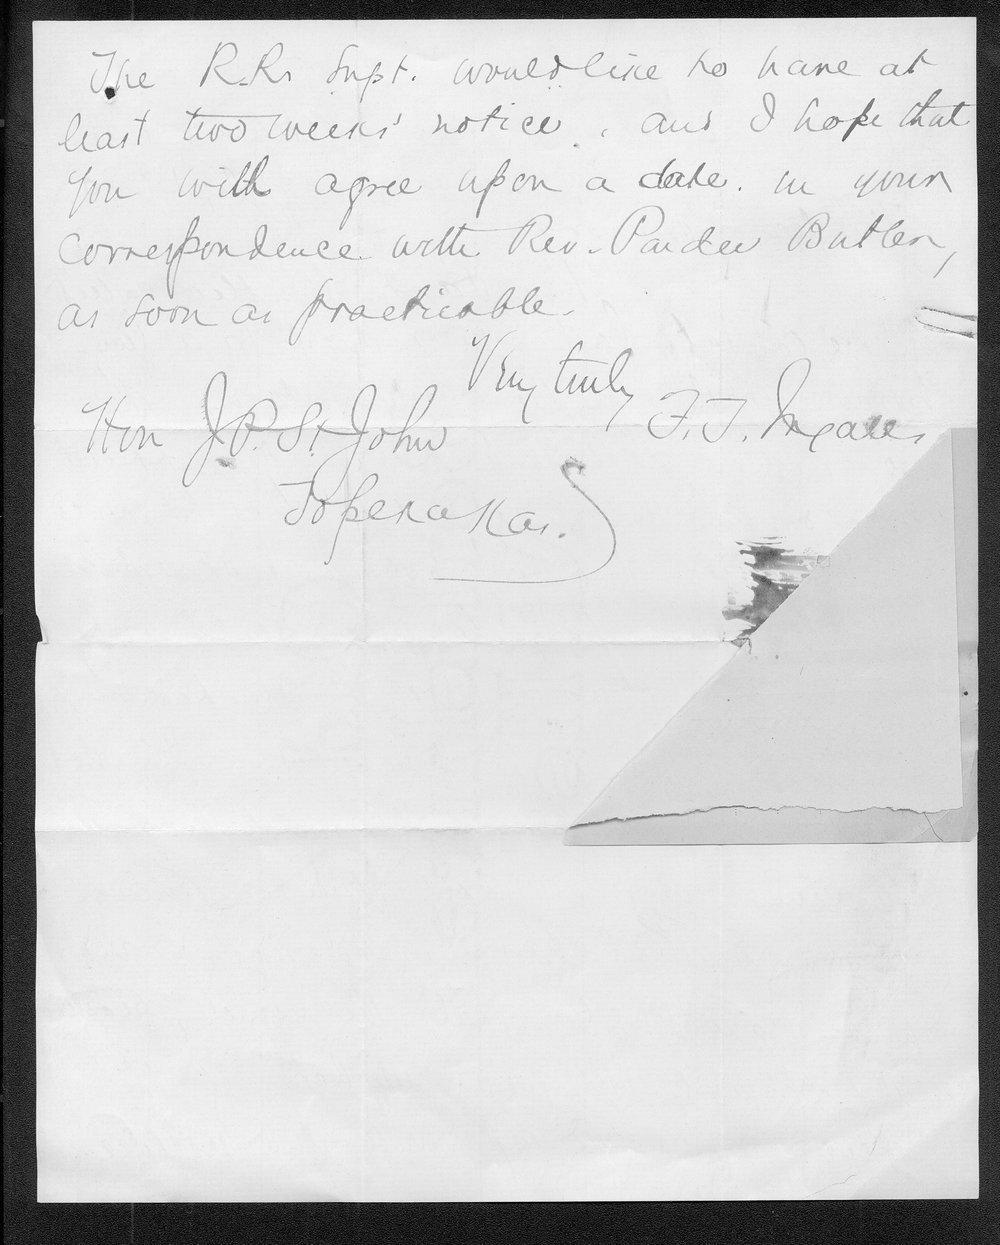 F. T. Ingalls to Governor John St. John - 2